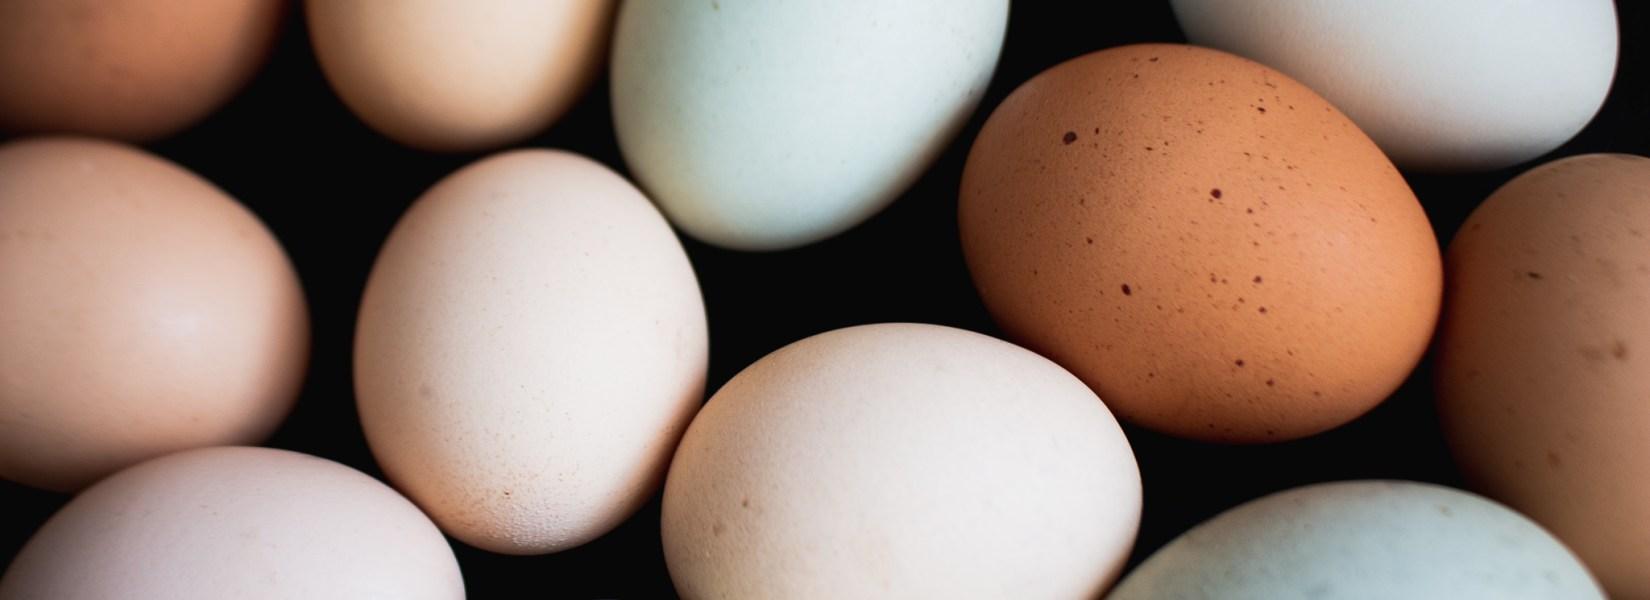 Choosing Chicks for a Colorful Egg Basket